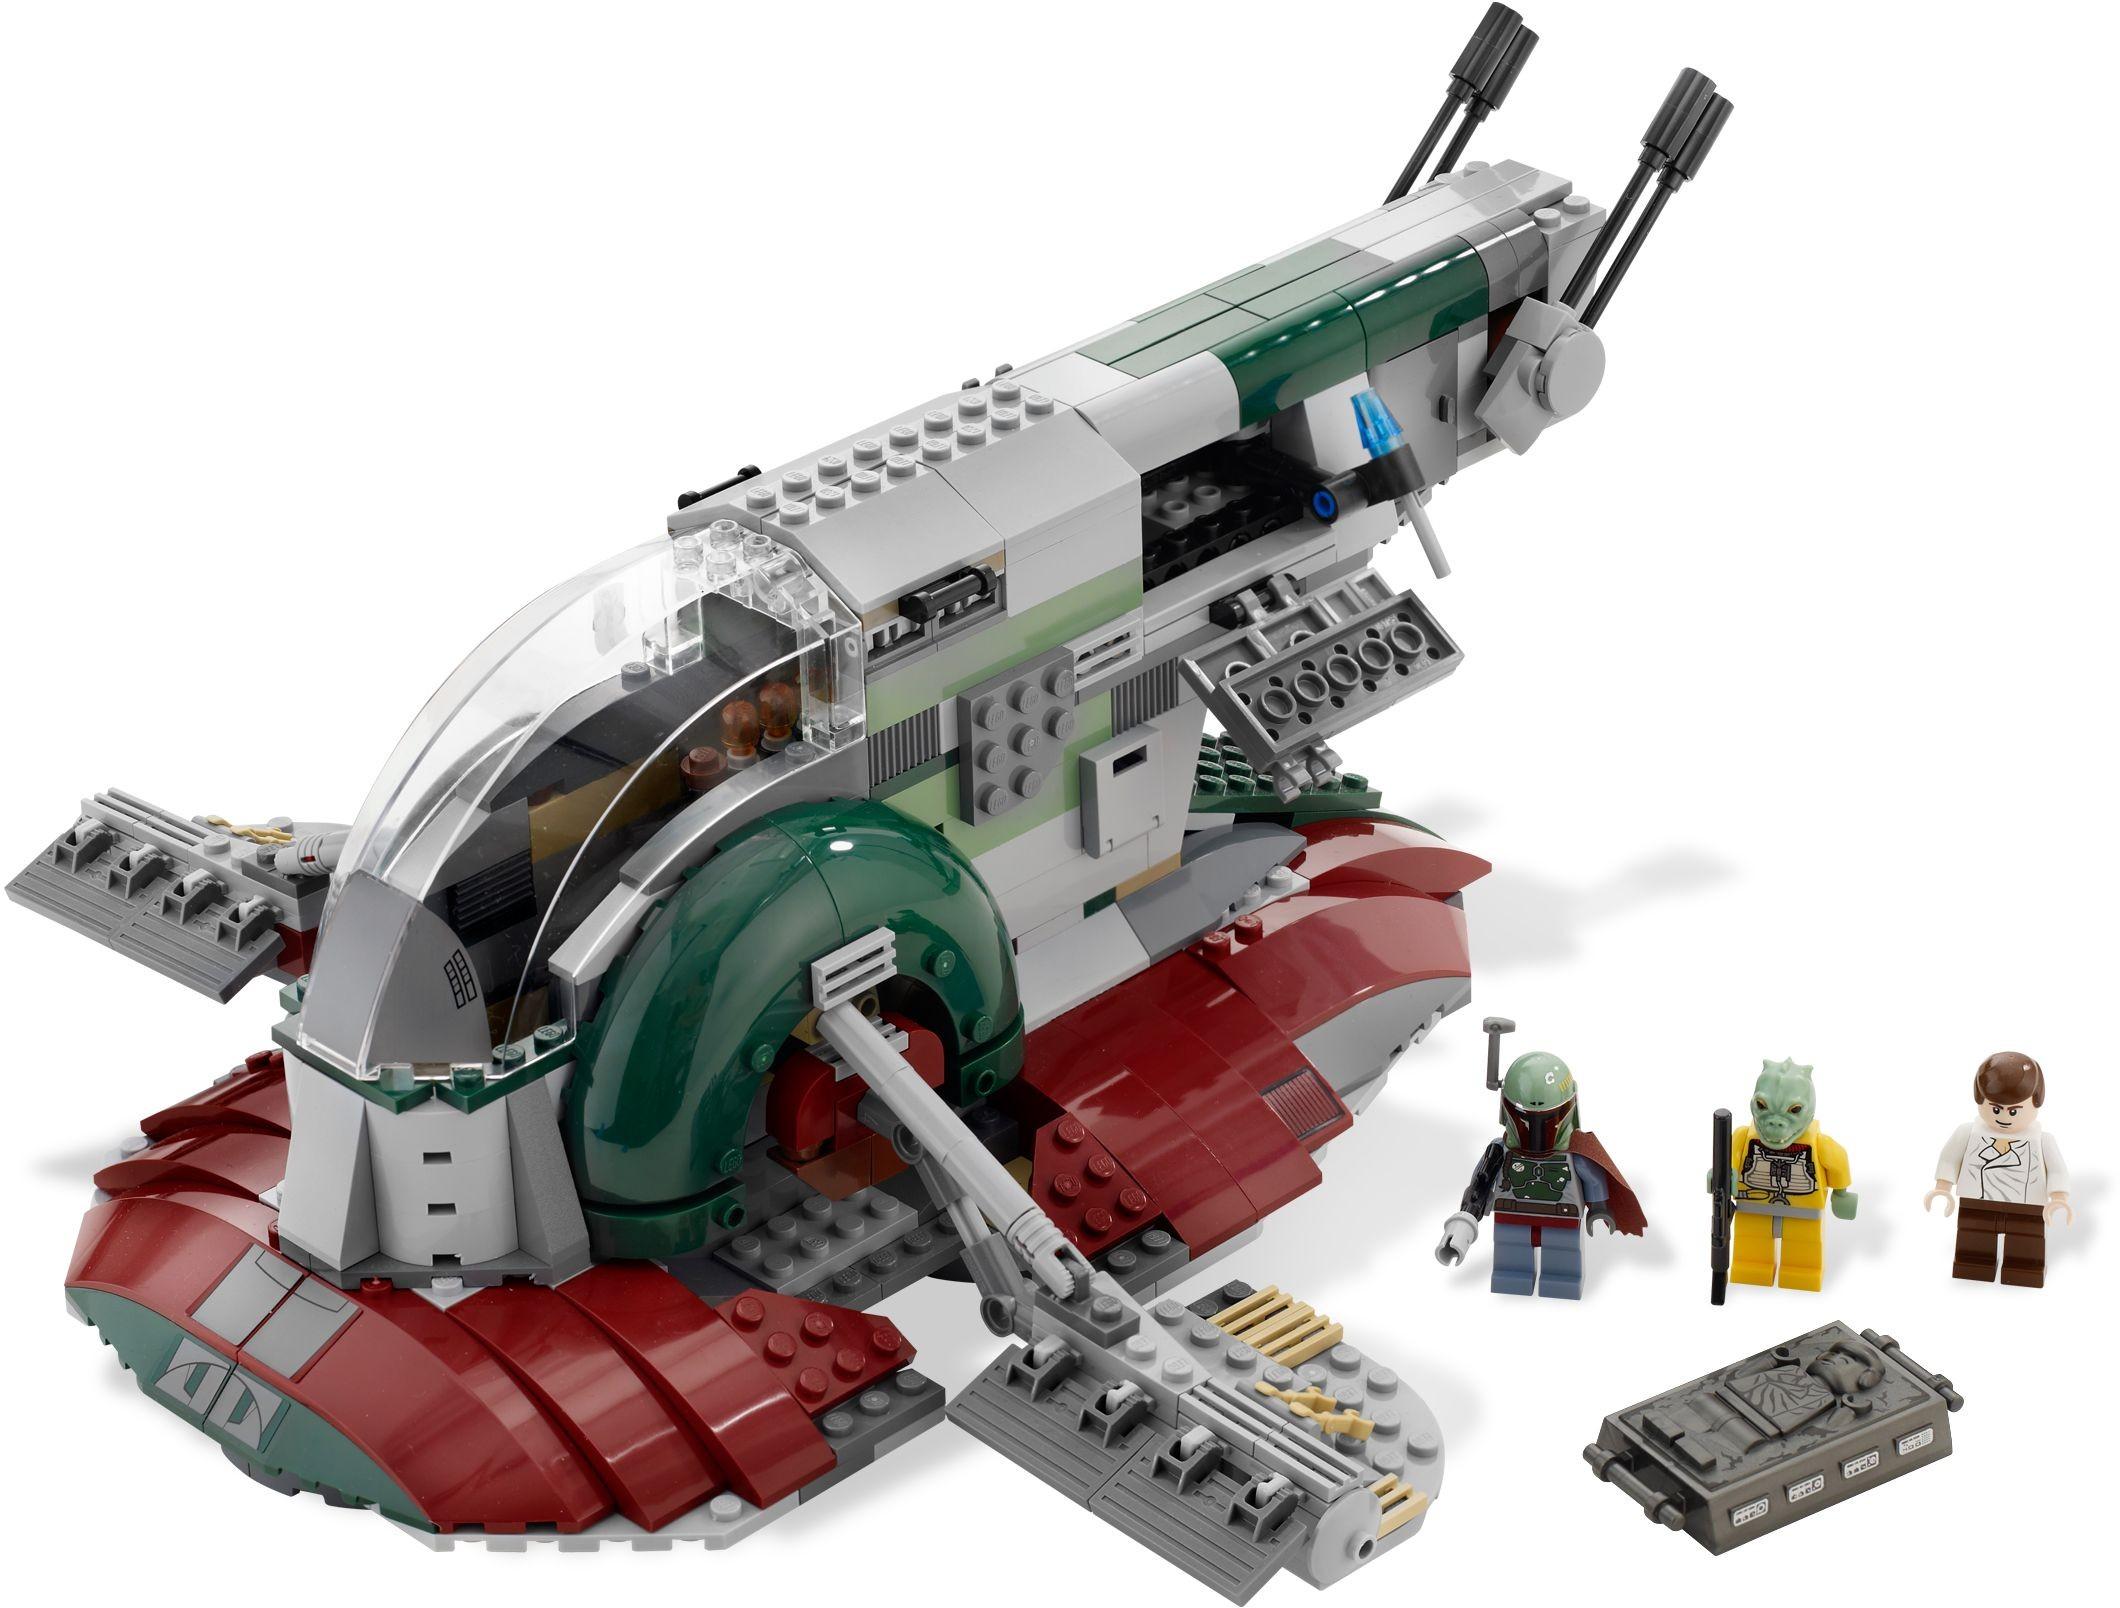 lego star wars 8089 instructions